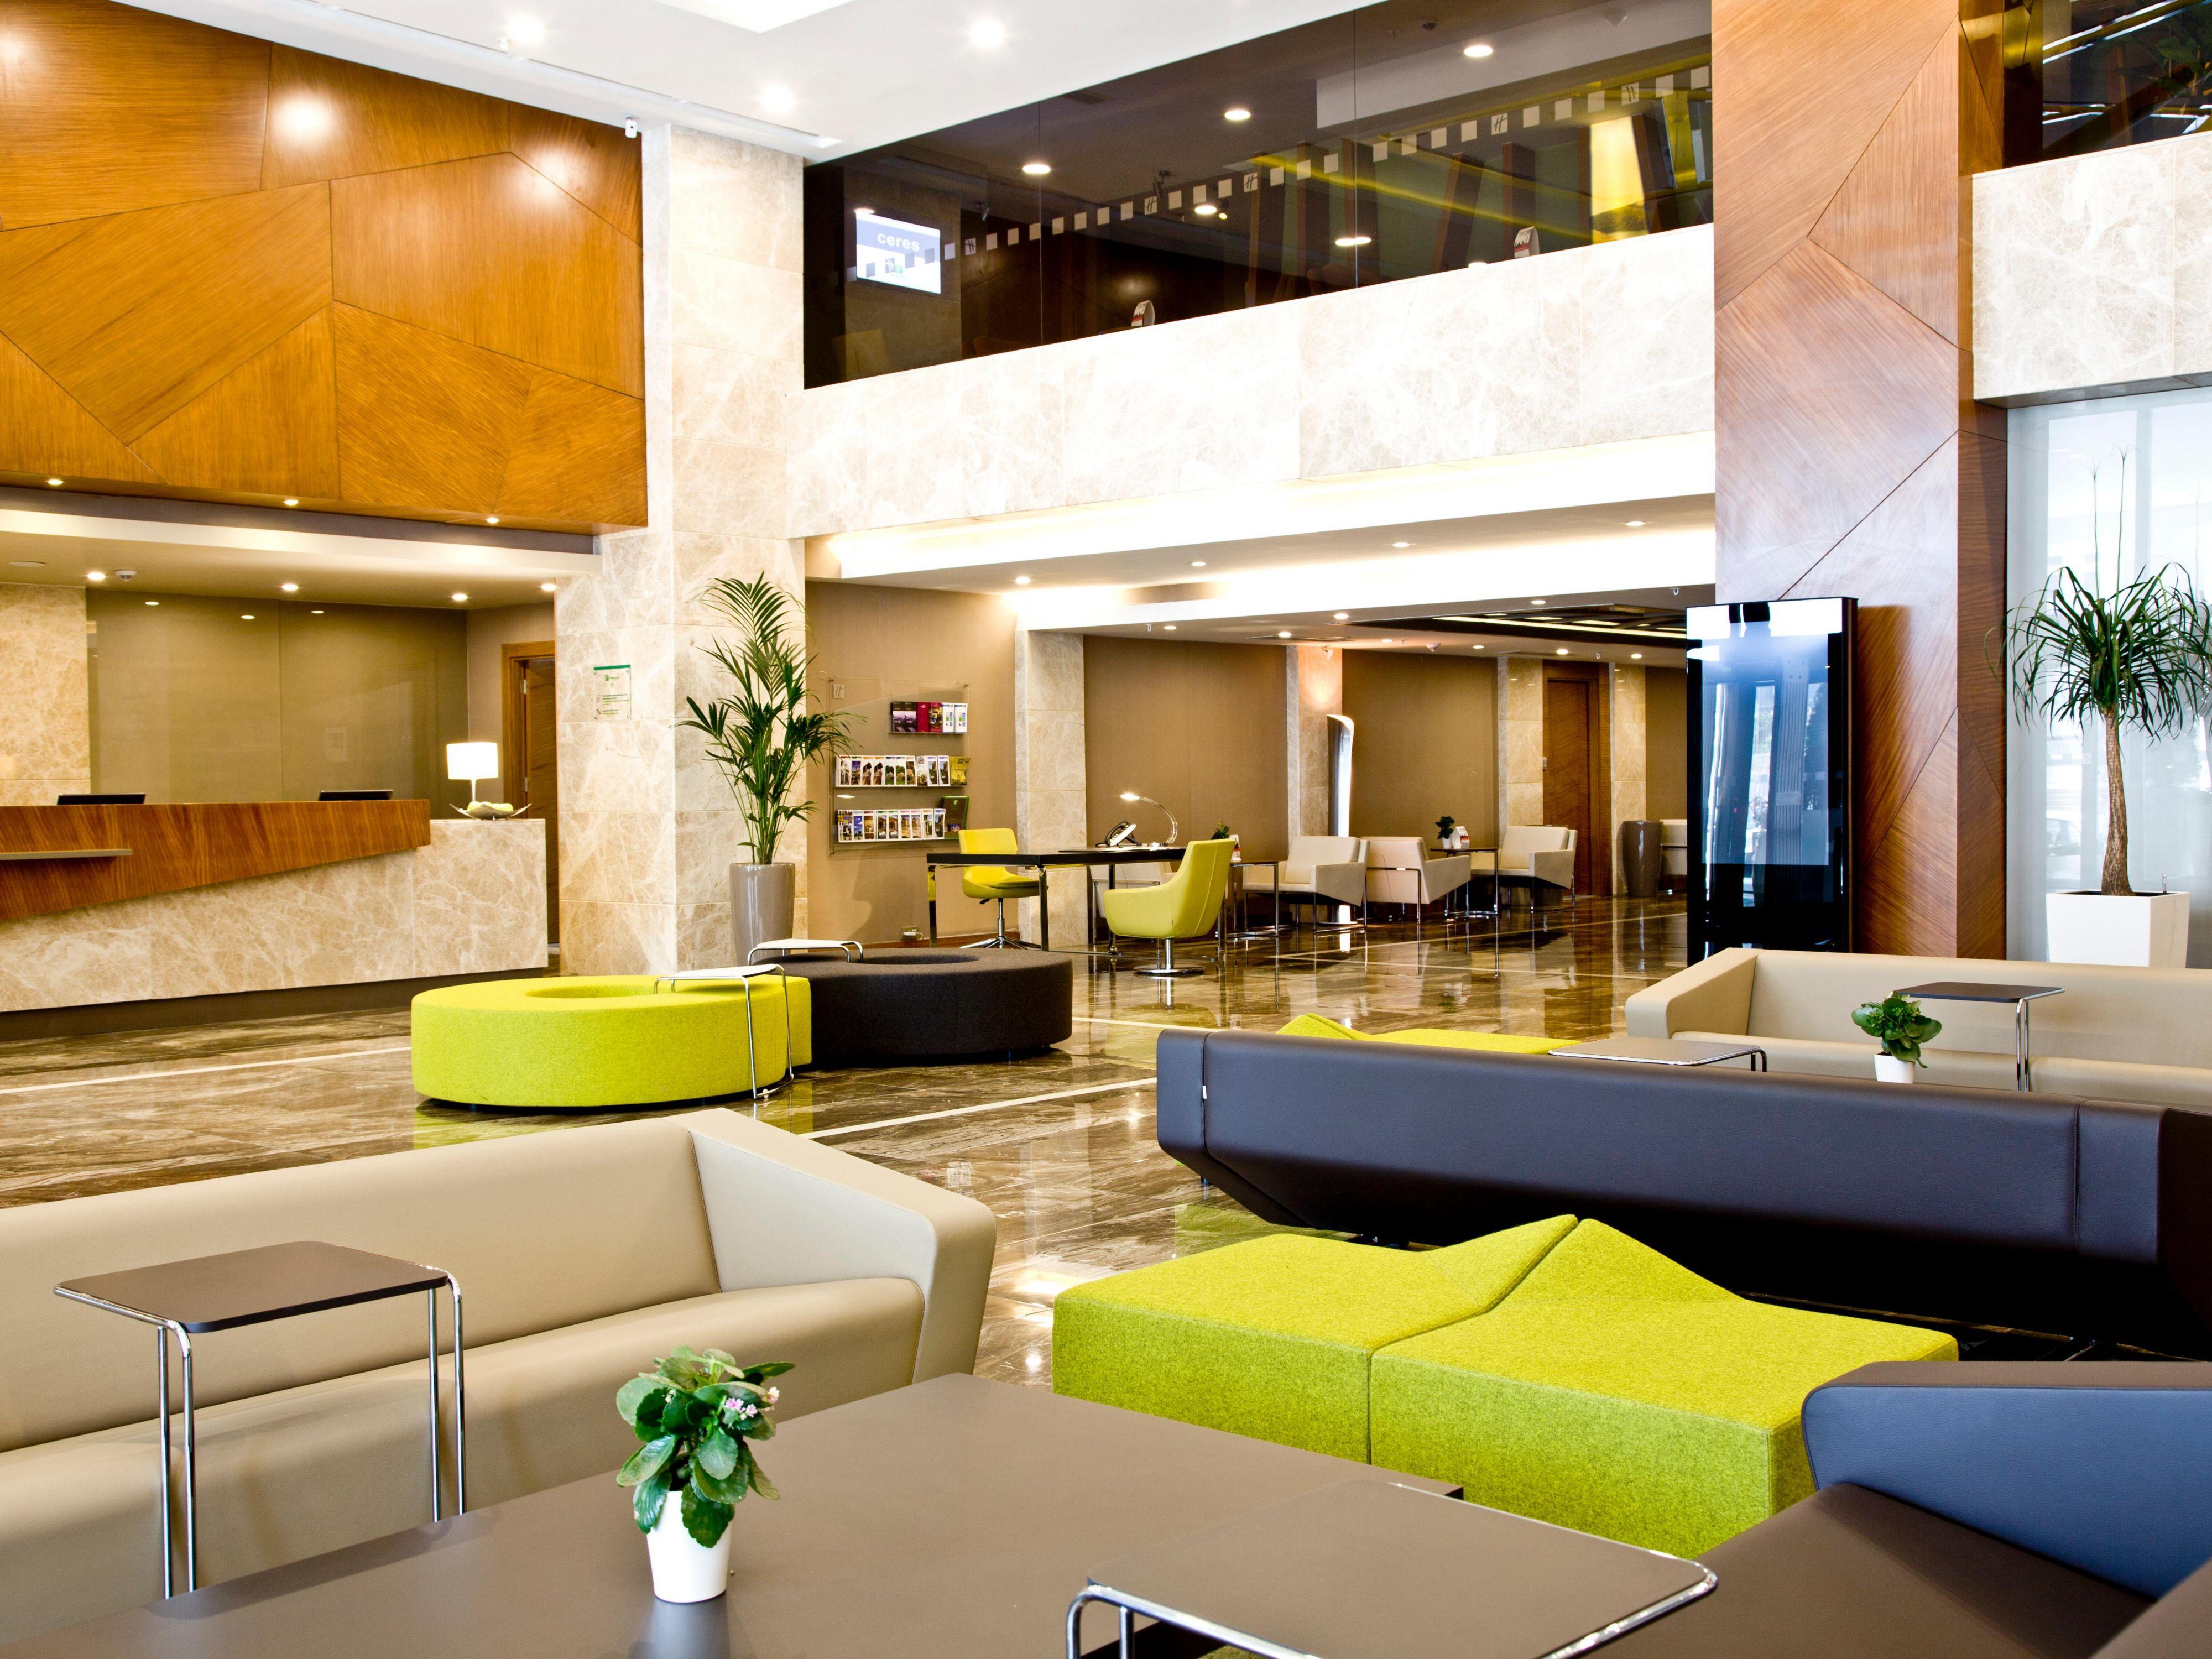 Holiday inn gaziantep sehitkamil hotel by ihg for Gaziantep hotel